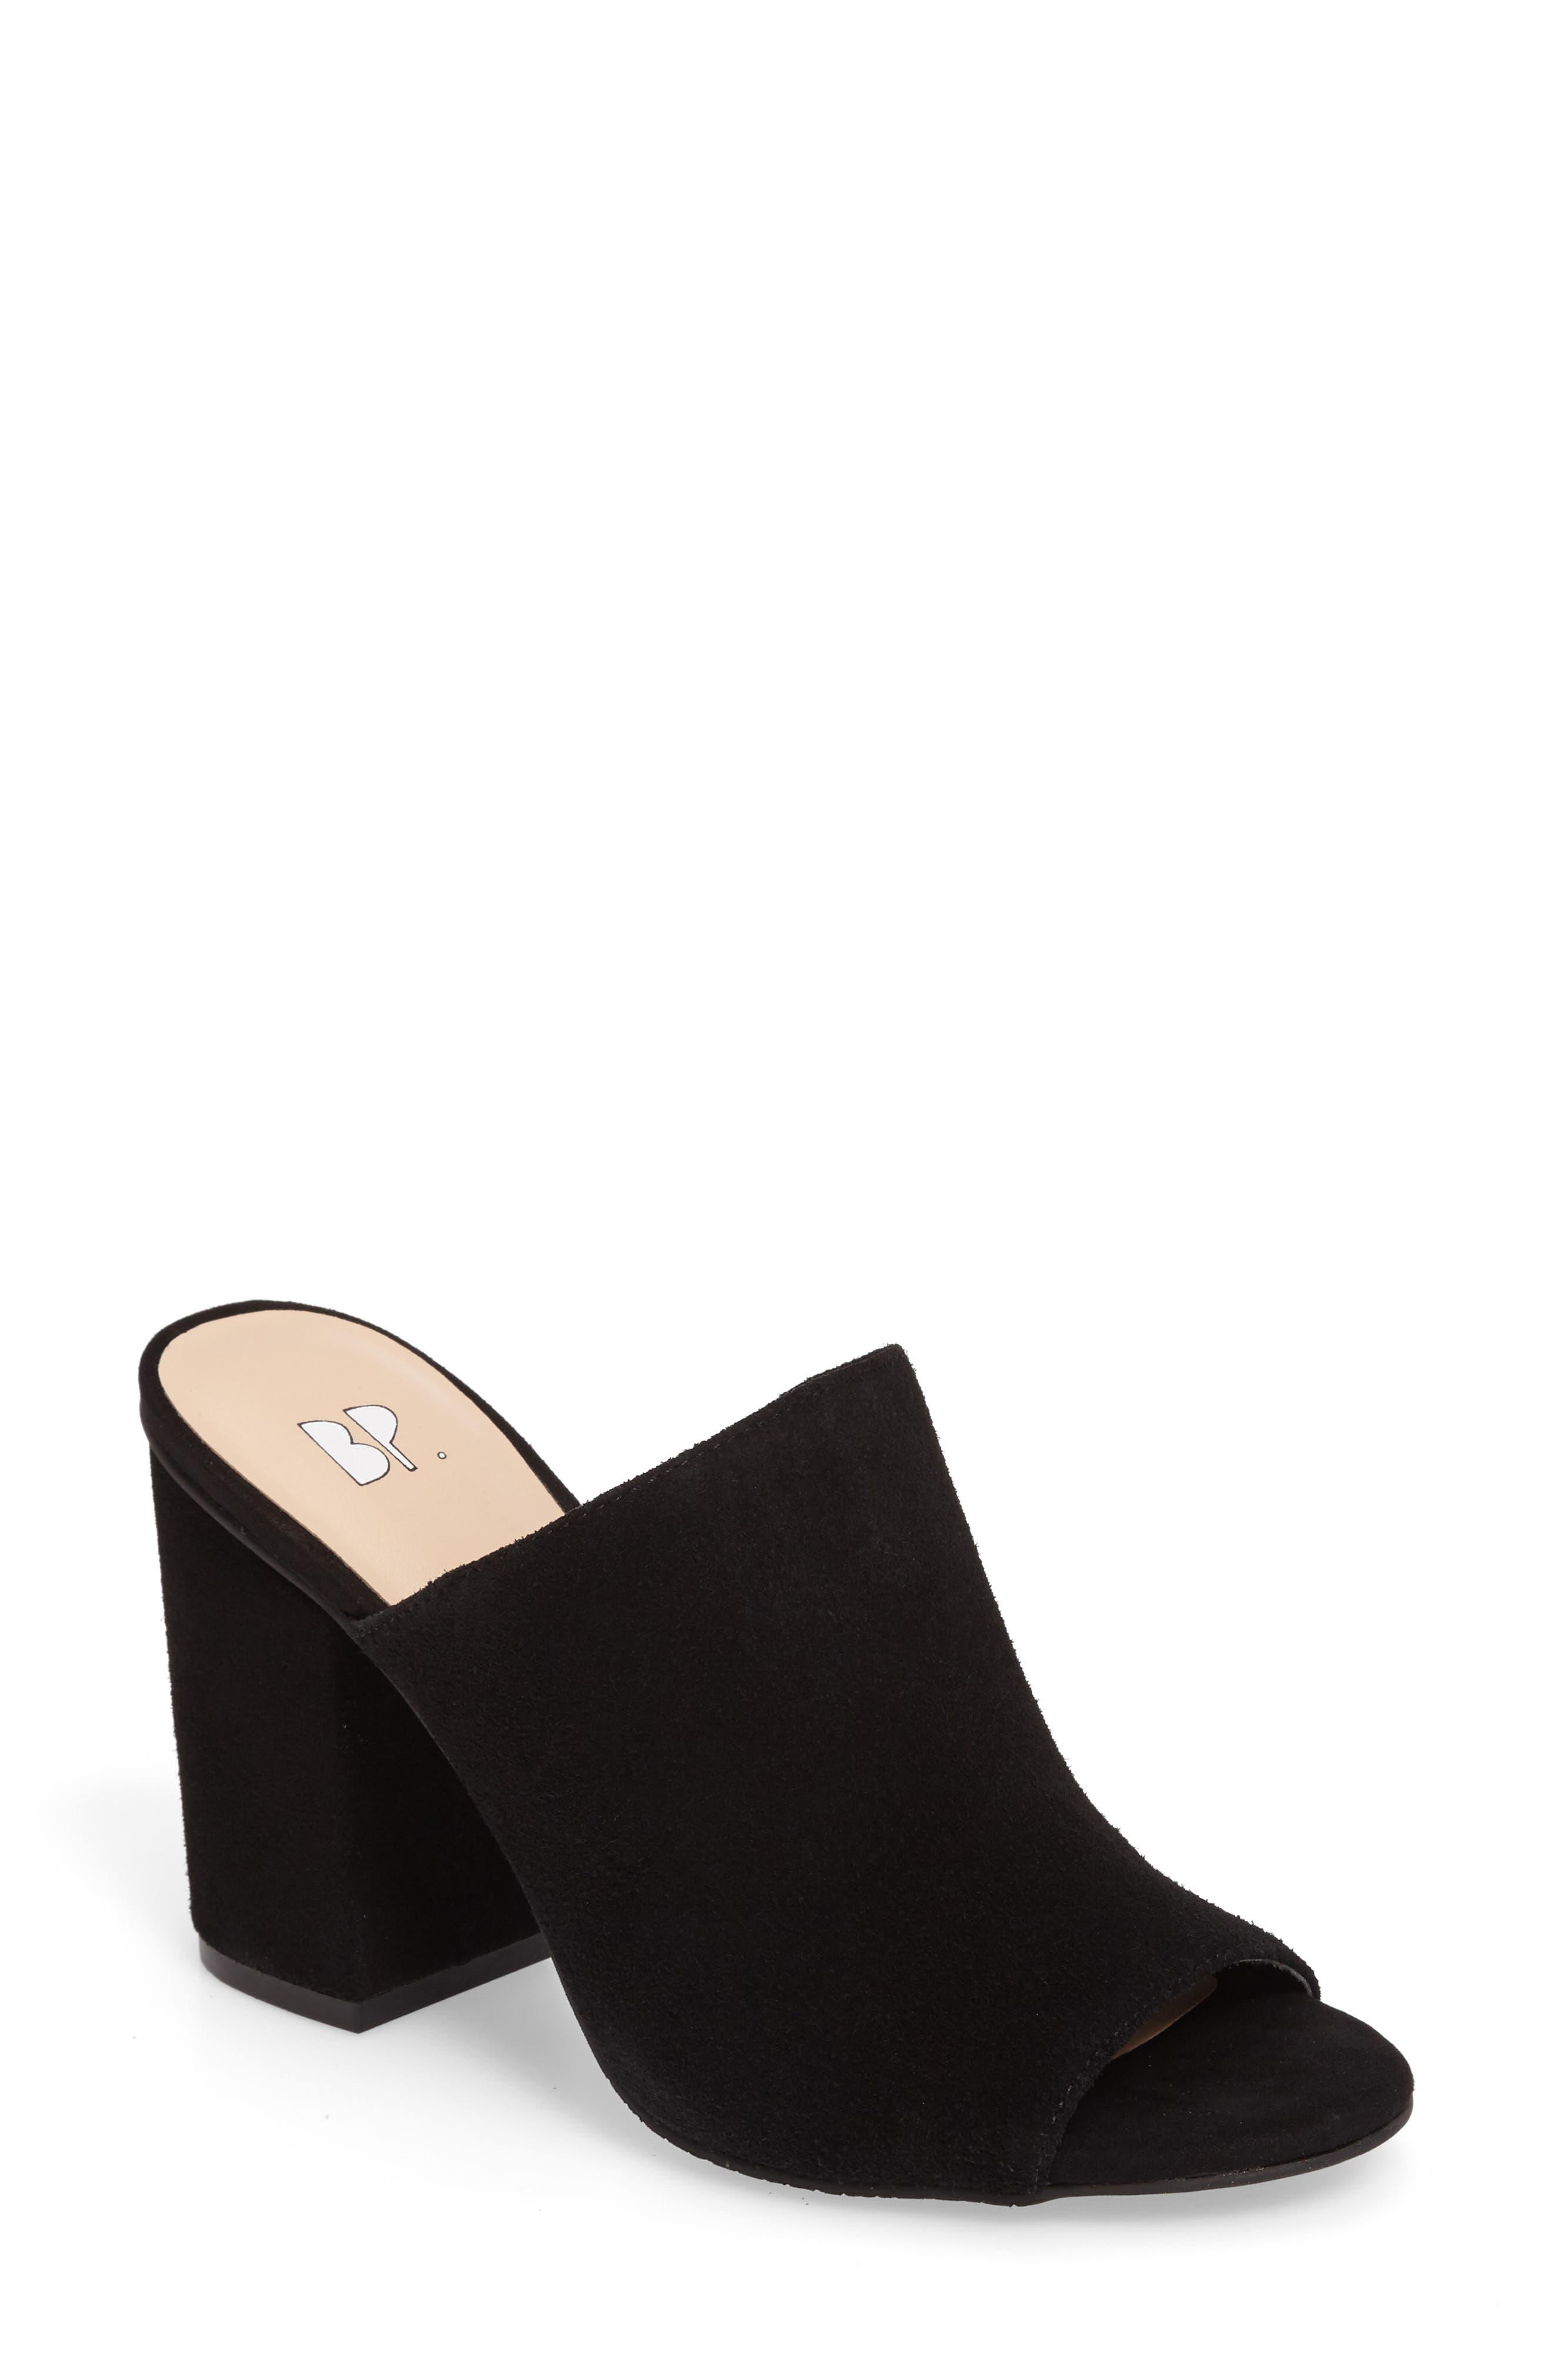 Tale Block Heel Sandal,                         Main,                         color, 001